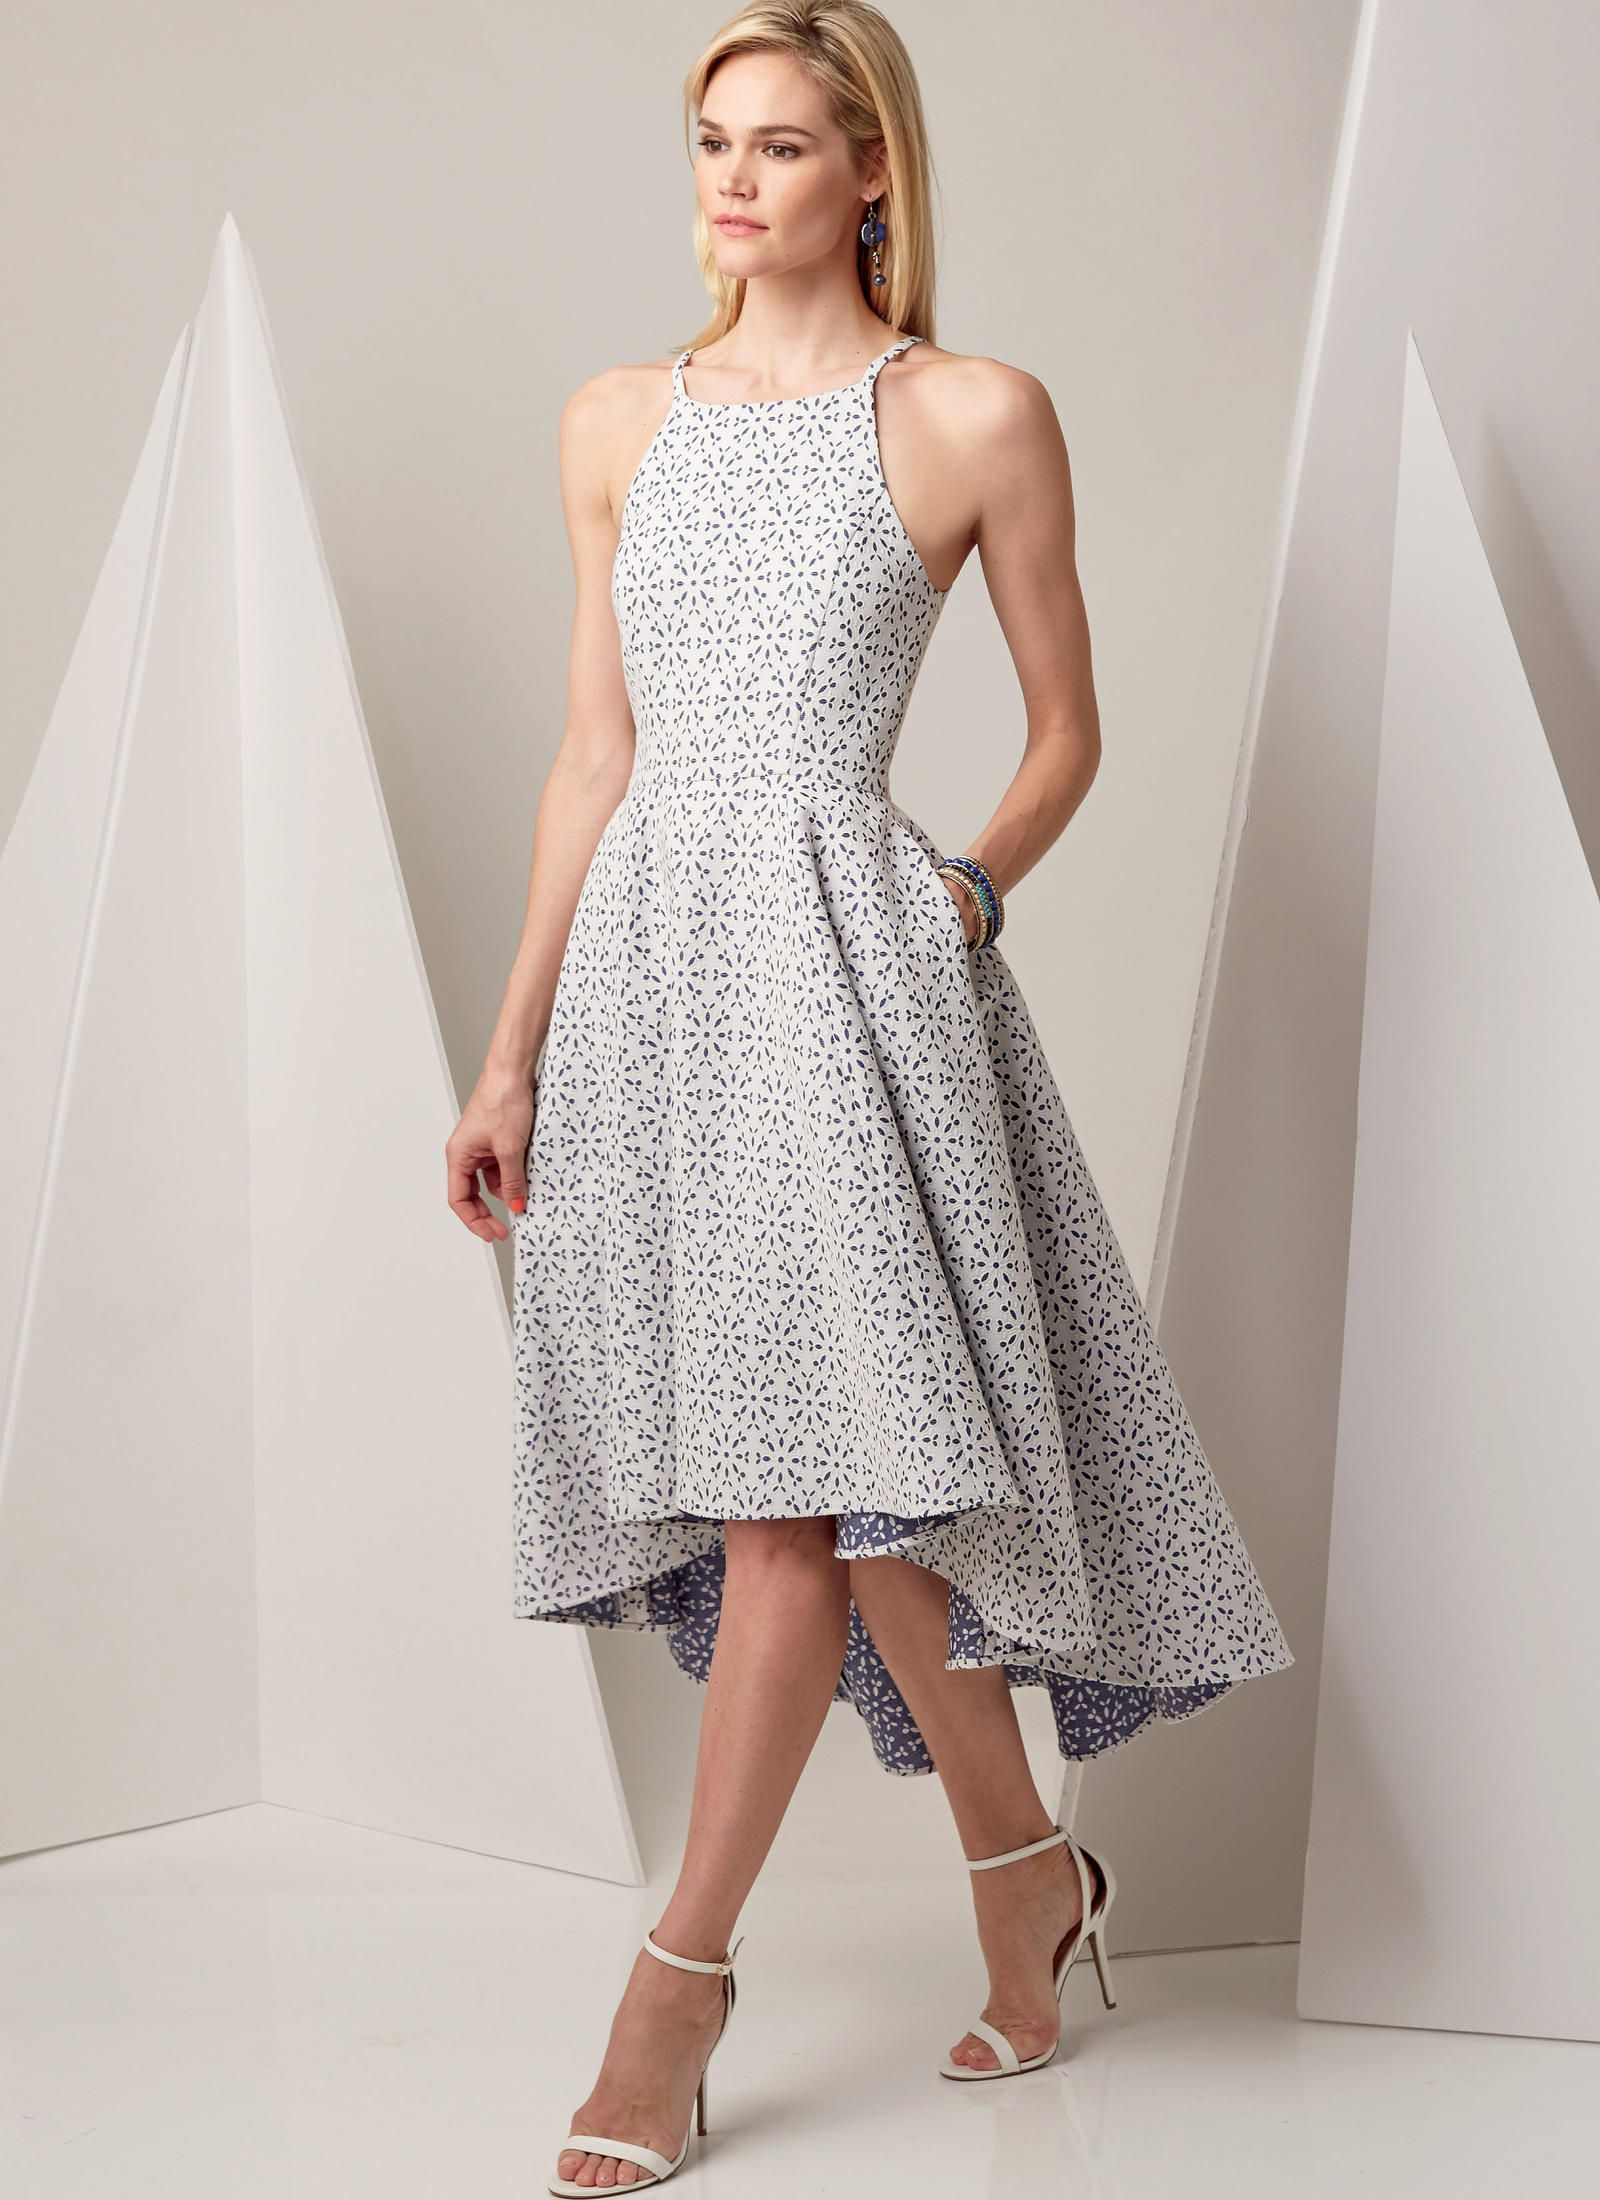 V9252 | Vogue Patterns - Dress with POCKETS! | VESTIDOS VERANO ...